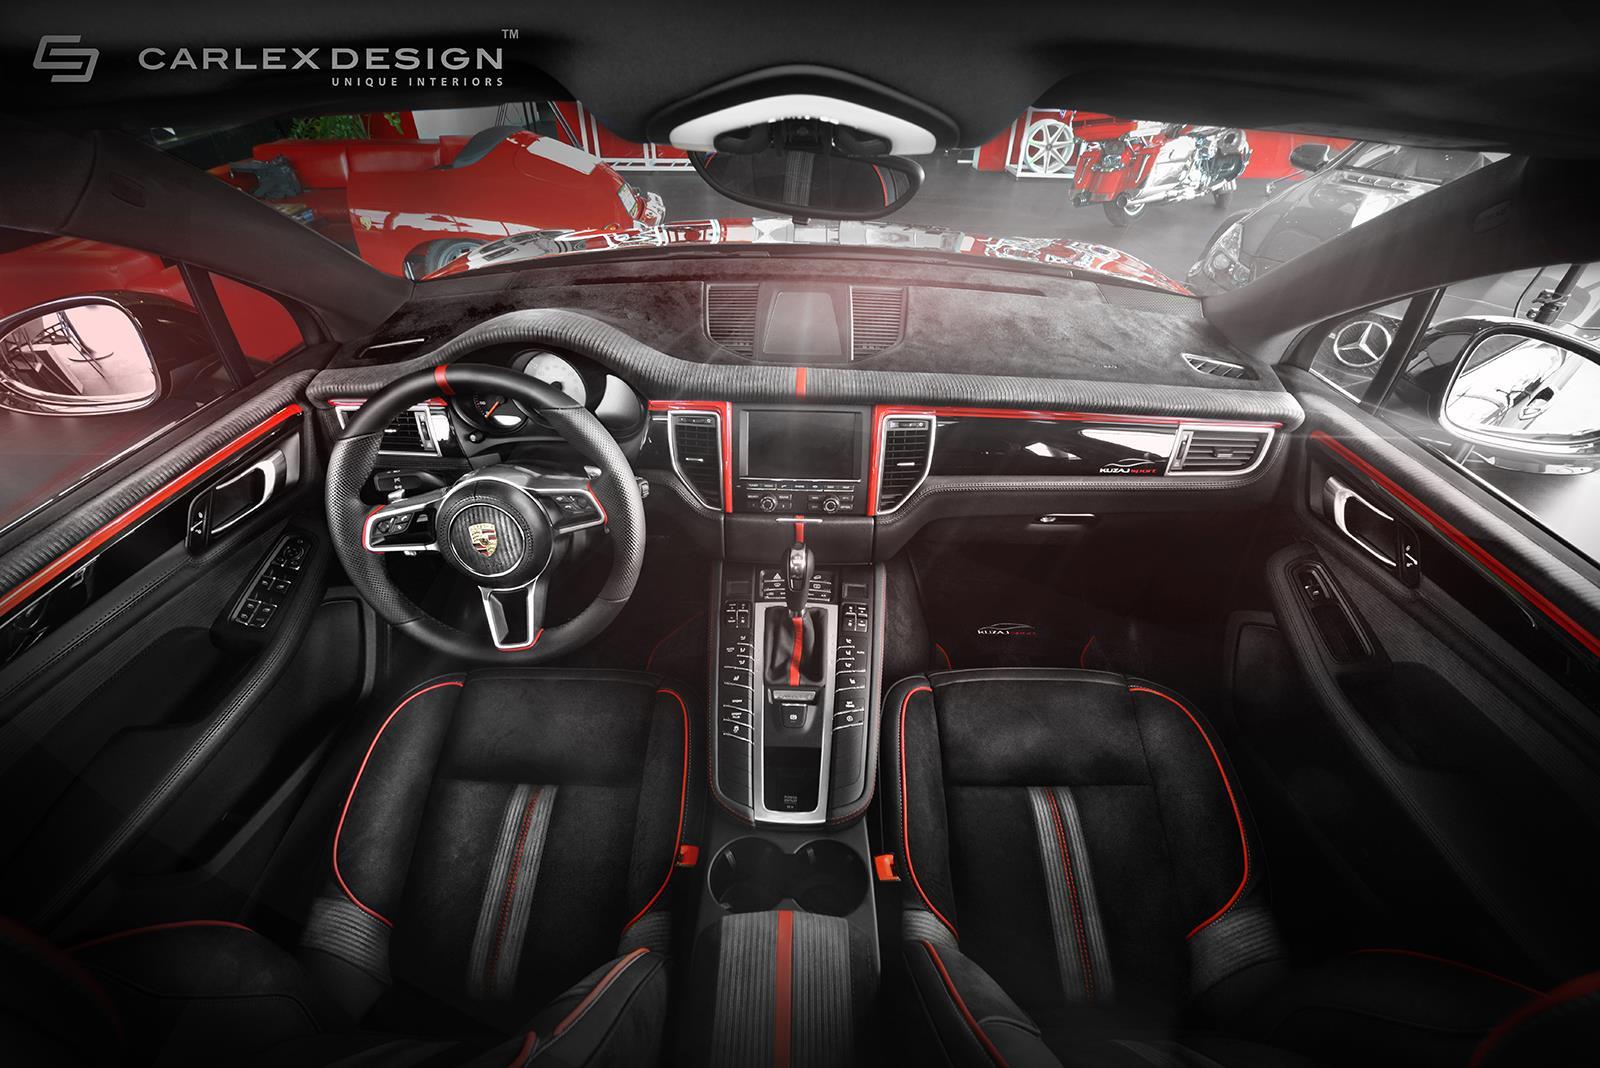 Porsche Macan Gets A Berserk Red And Black Interior Makeover From Carlex Design Autoevolution